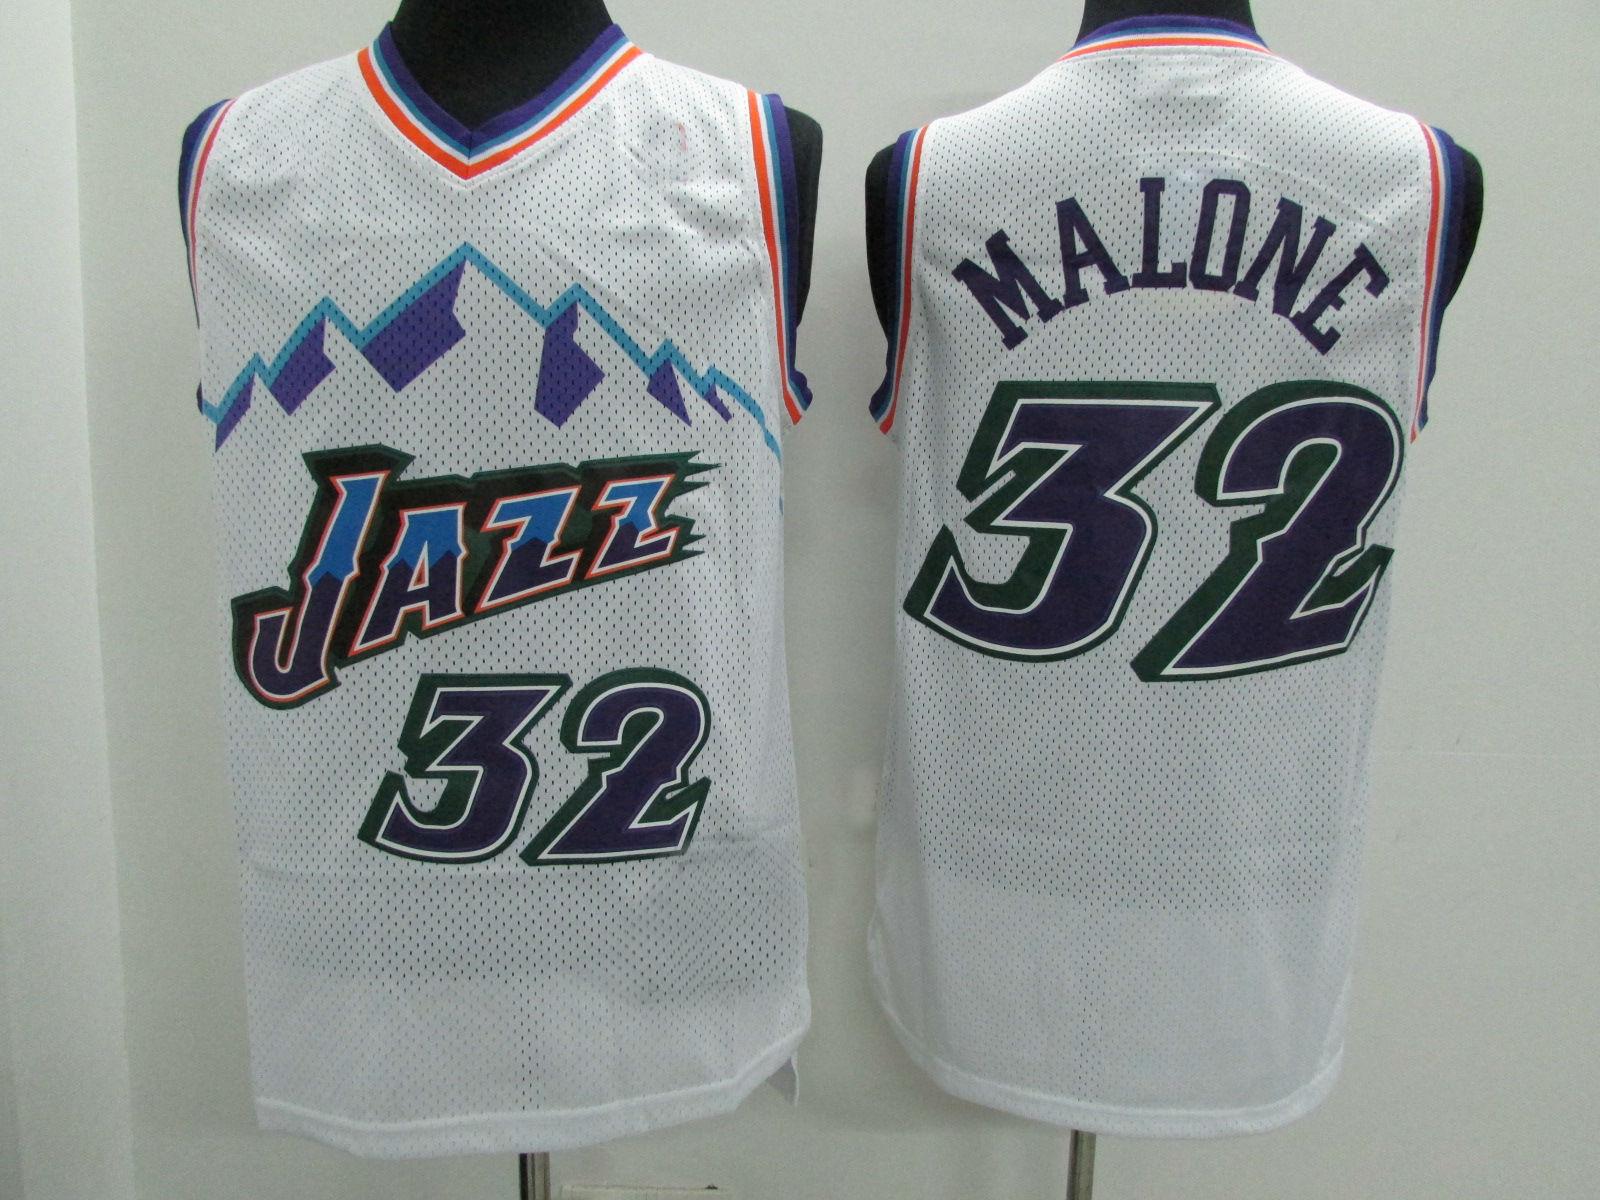 8d1d957d2e46 Utah Jazz Retro Jerseys  32 Malone White Throwback Basketball Jersey ...